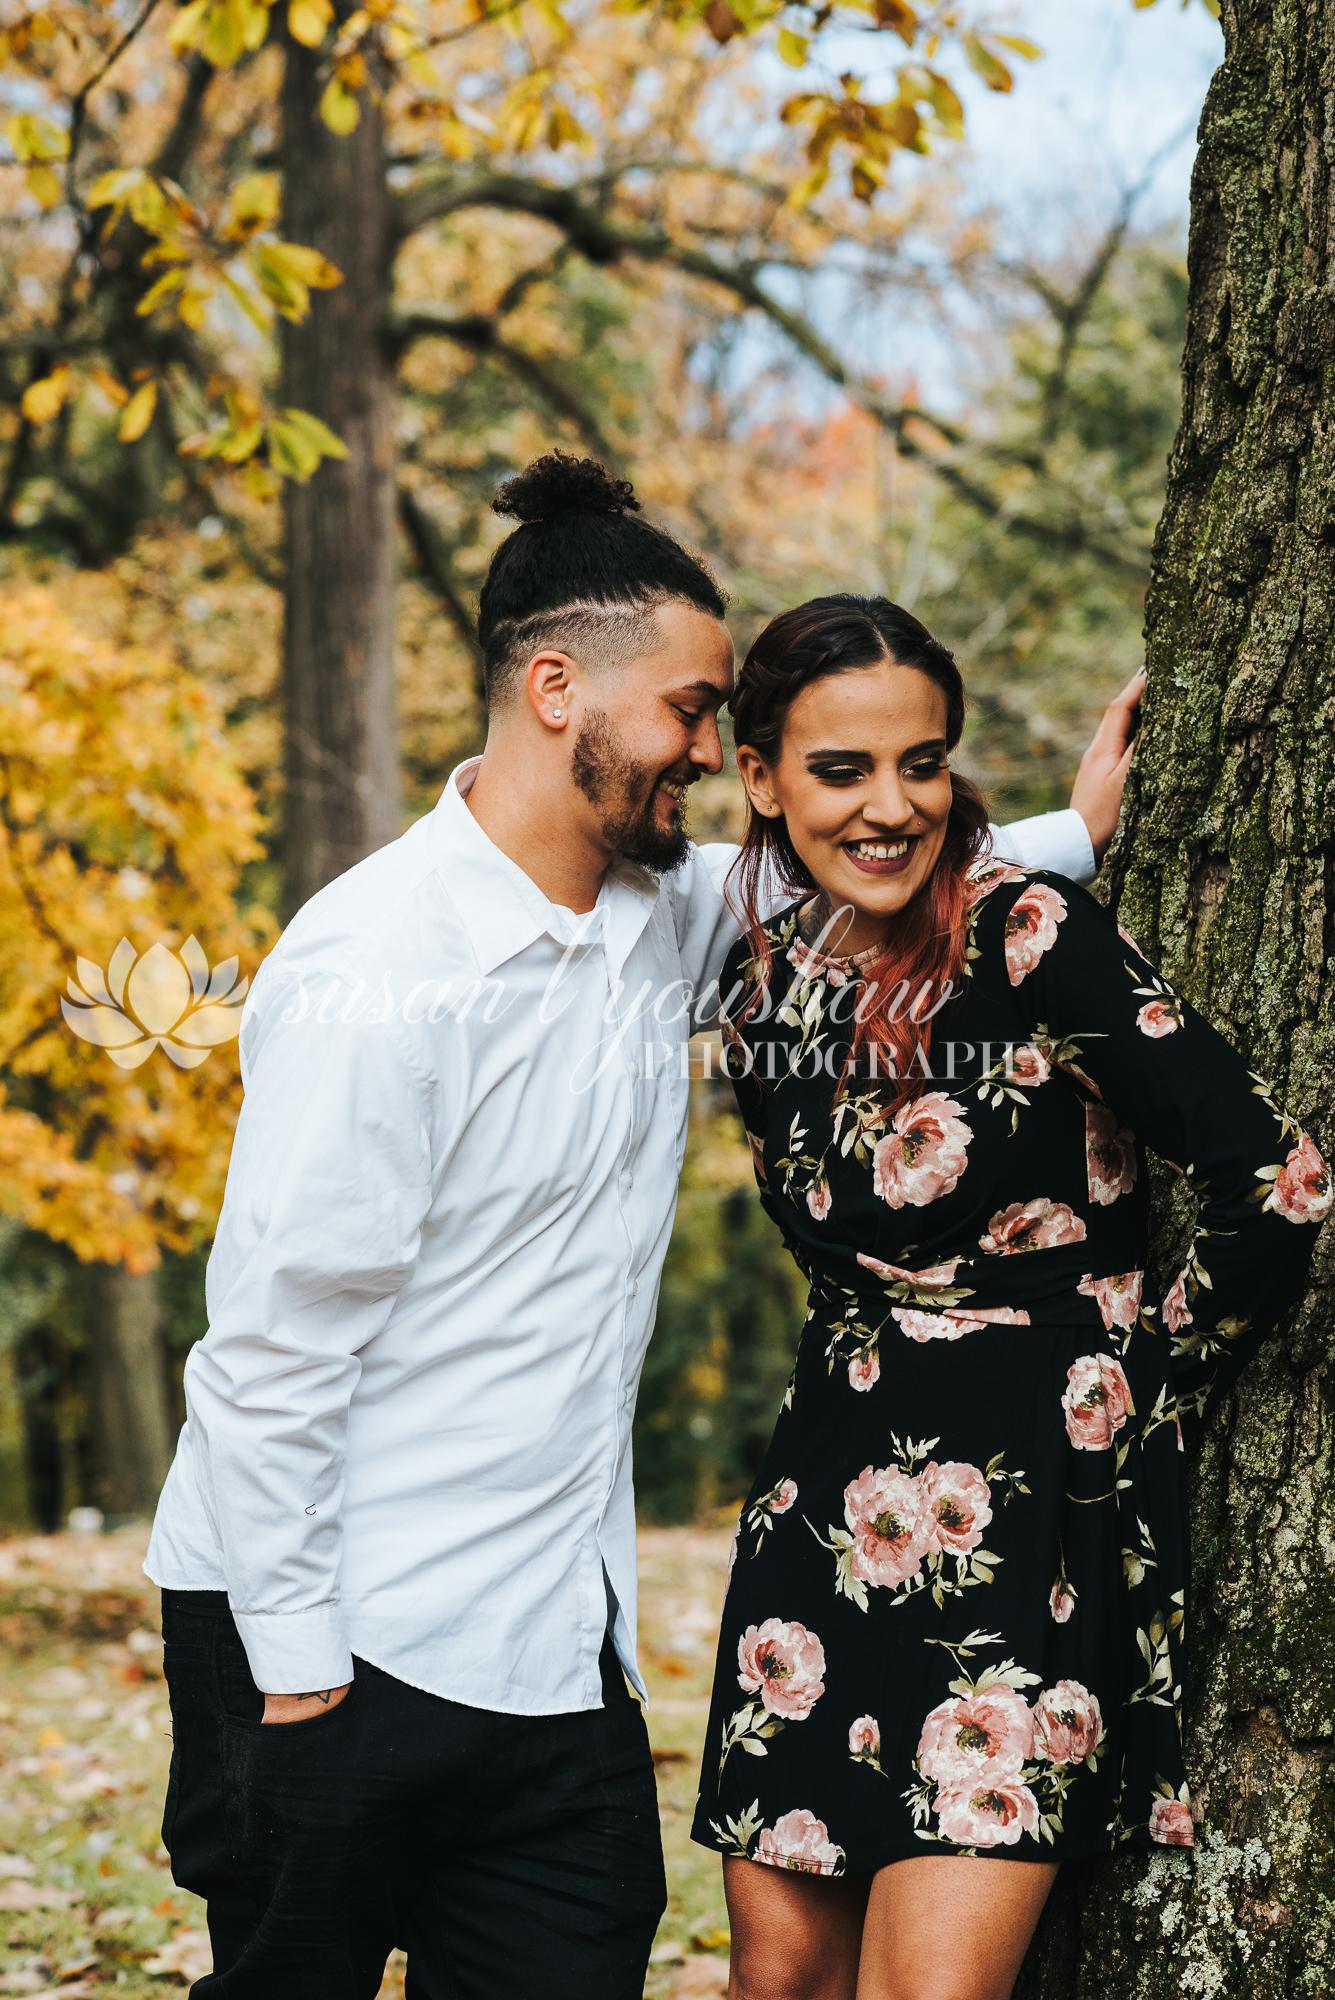 BLOG Theresa and Donavyn 10-28-2018-3.jpg